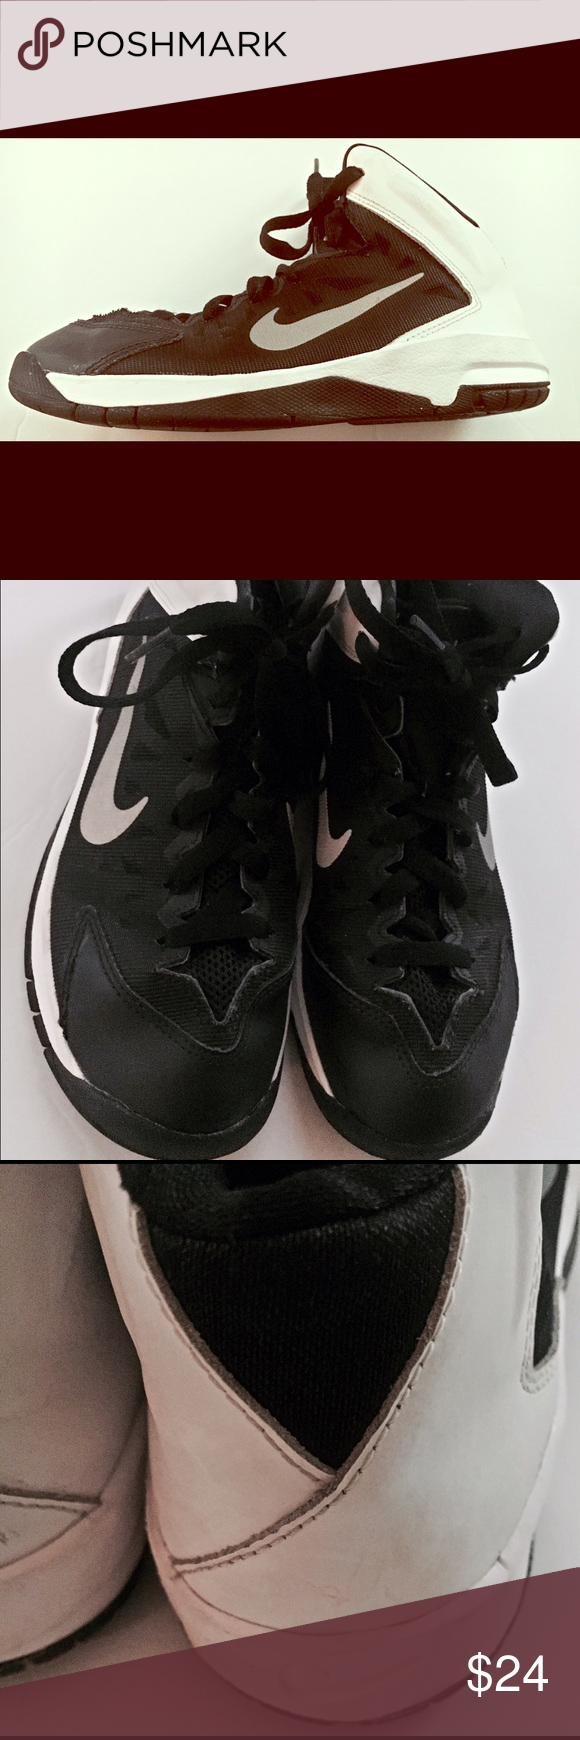 Nike Hyper Quickness Kids size 2.5Y black/white Nike Hyper Quickness Kids  size 2.5